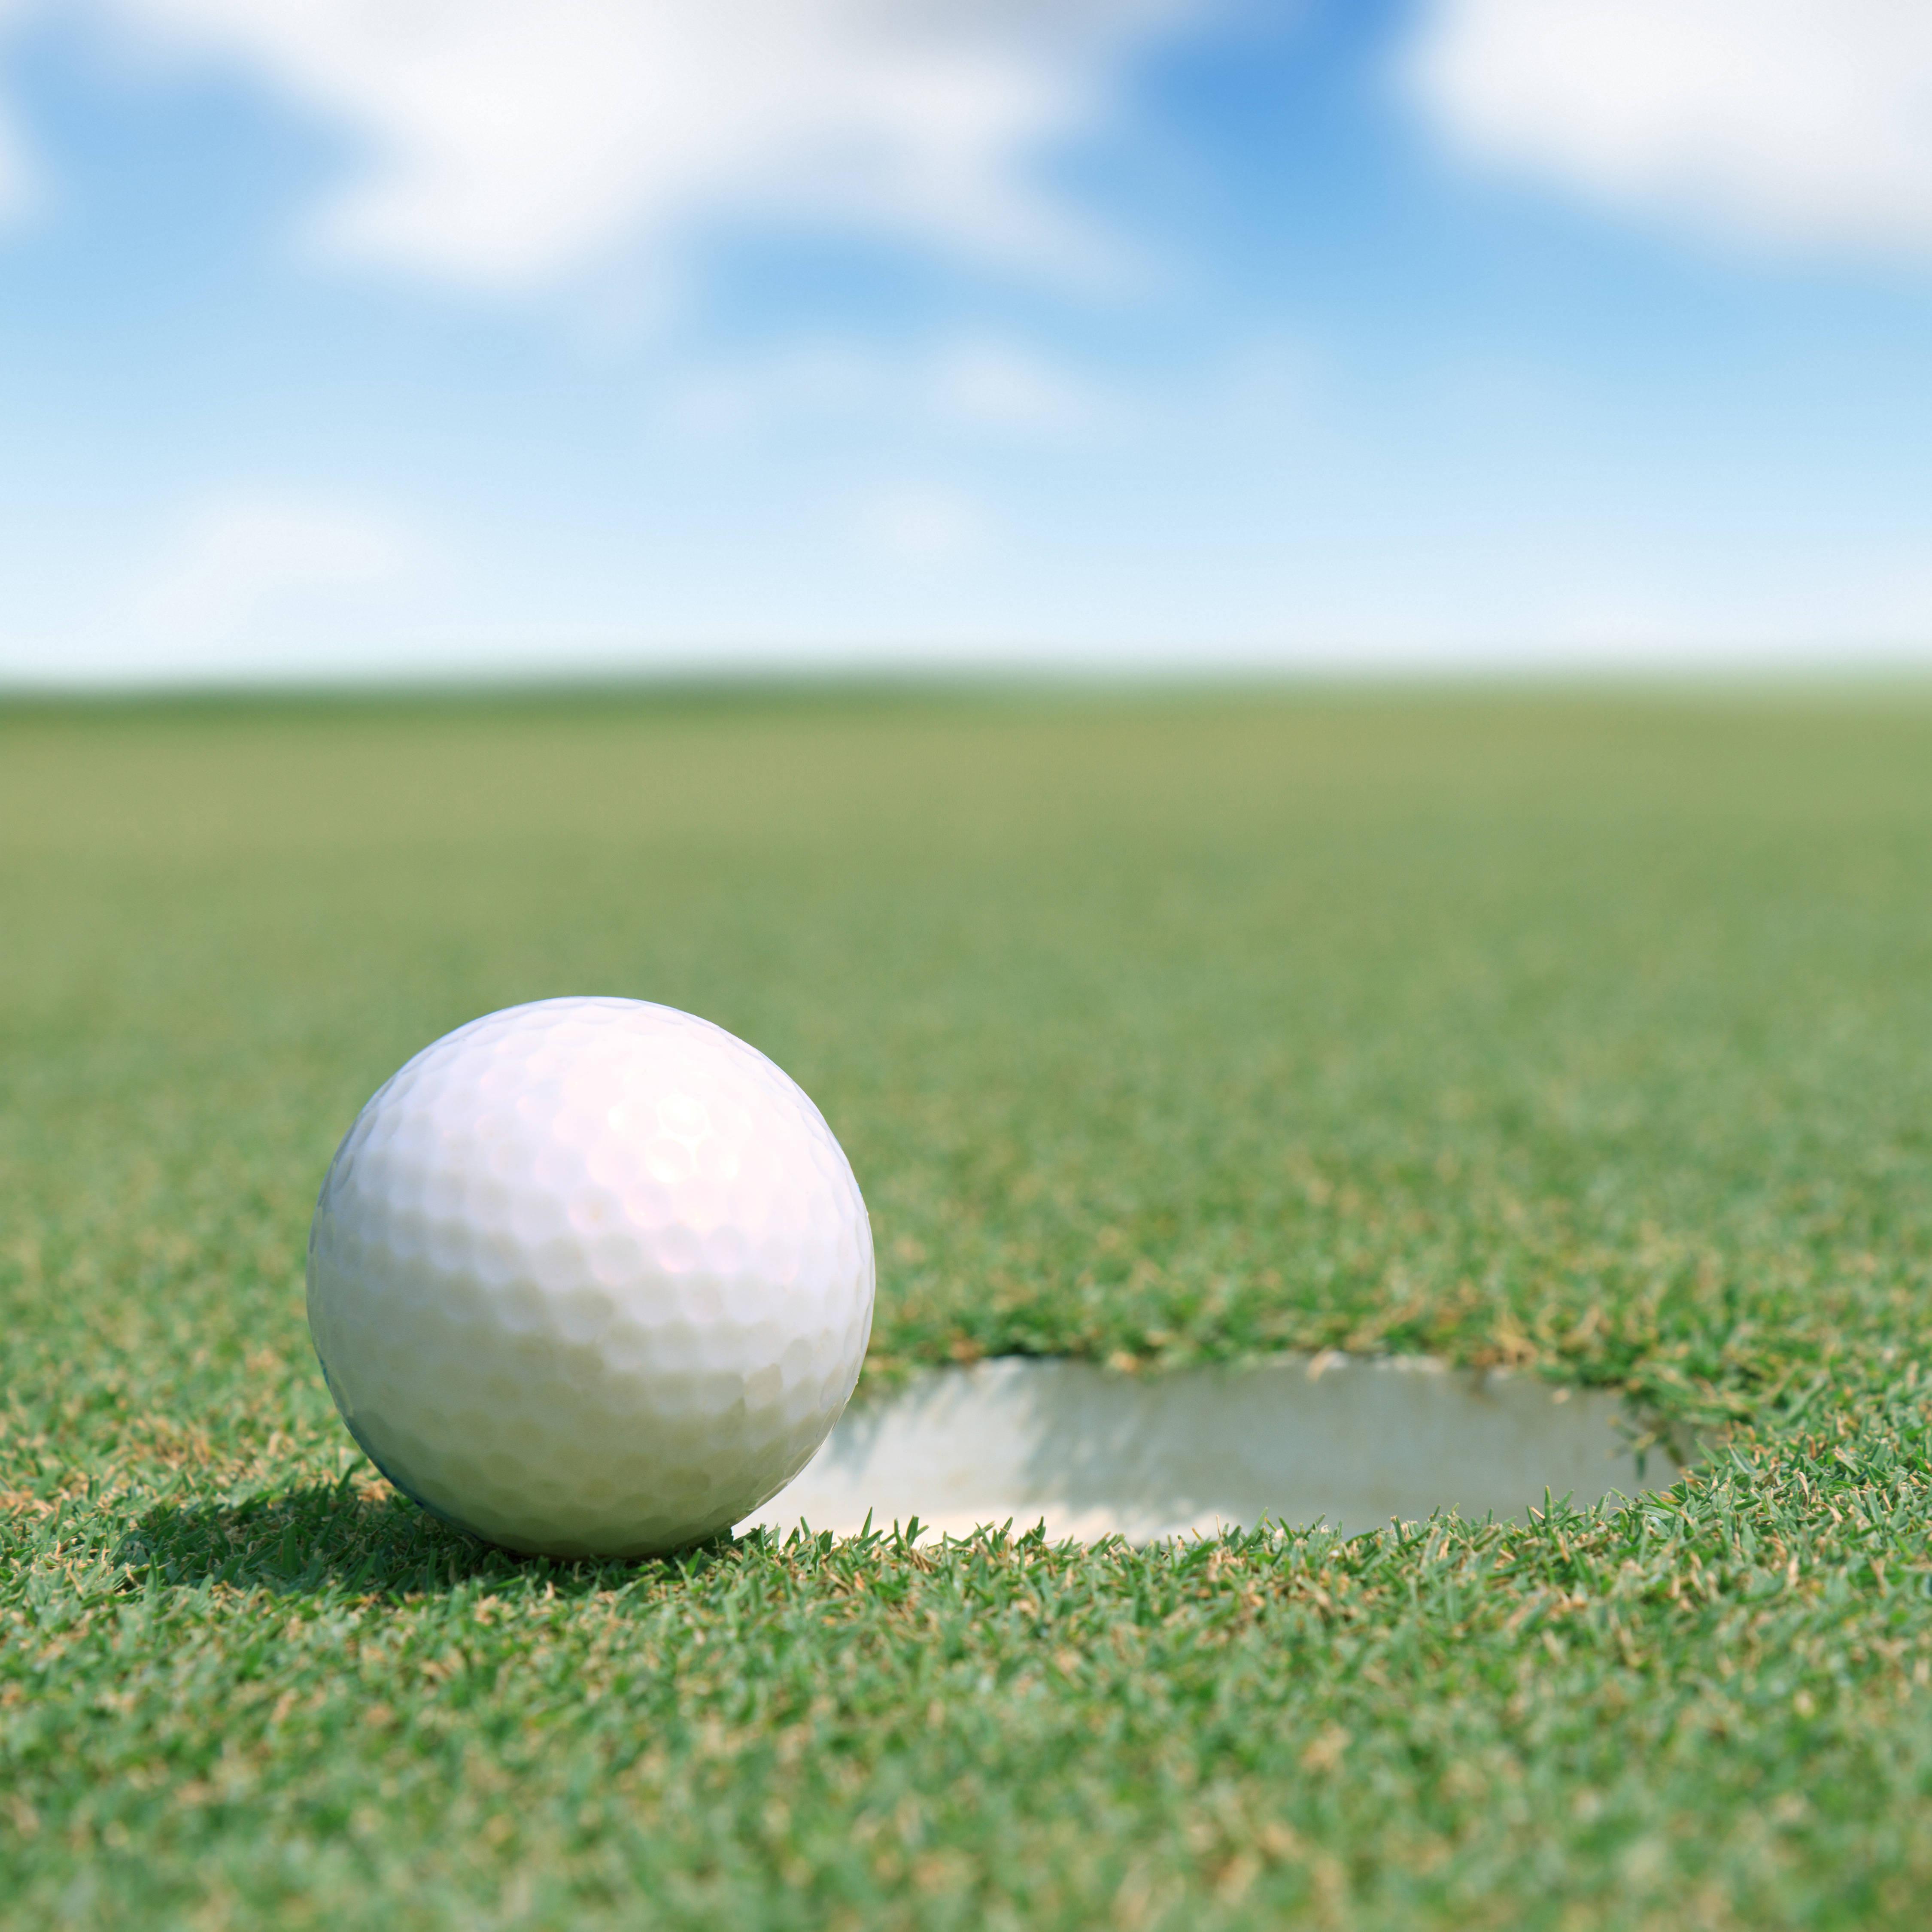 02a36cebd31f3eb6bf6b_Golf_ball_at_hole_photo.jpg